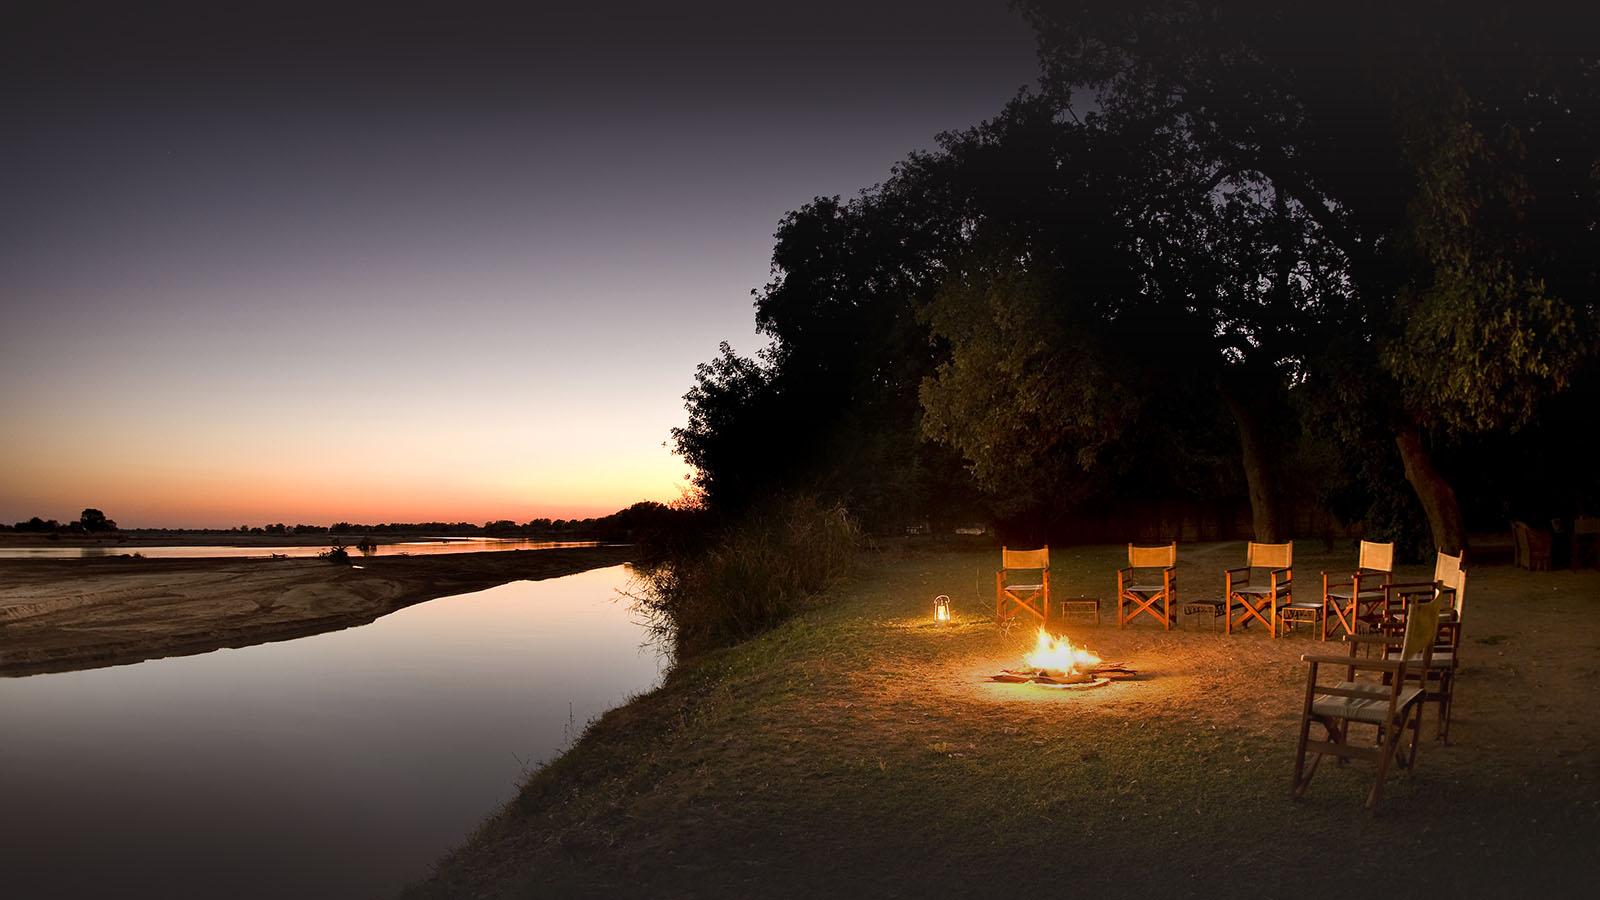 tafika-camp-lodge-zambia-in-style-tours-safari-packages-lodges-south-luangwa-national-park-breakfast-sunrise